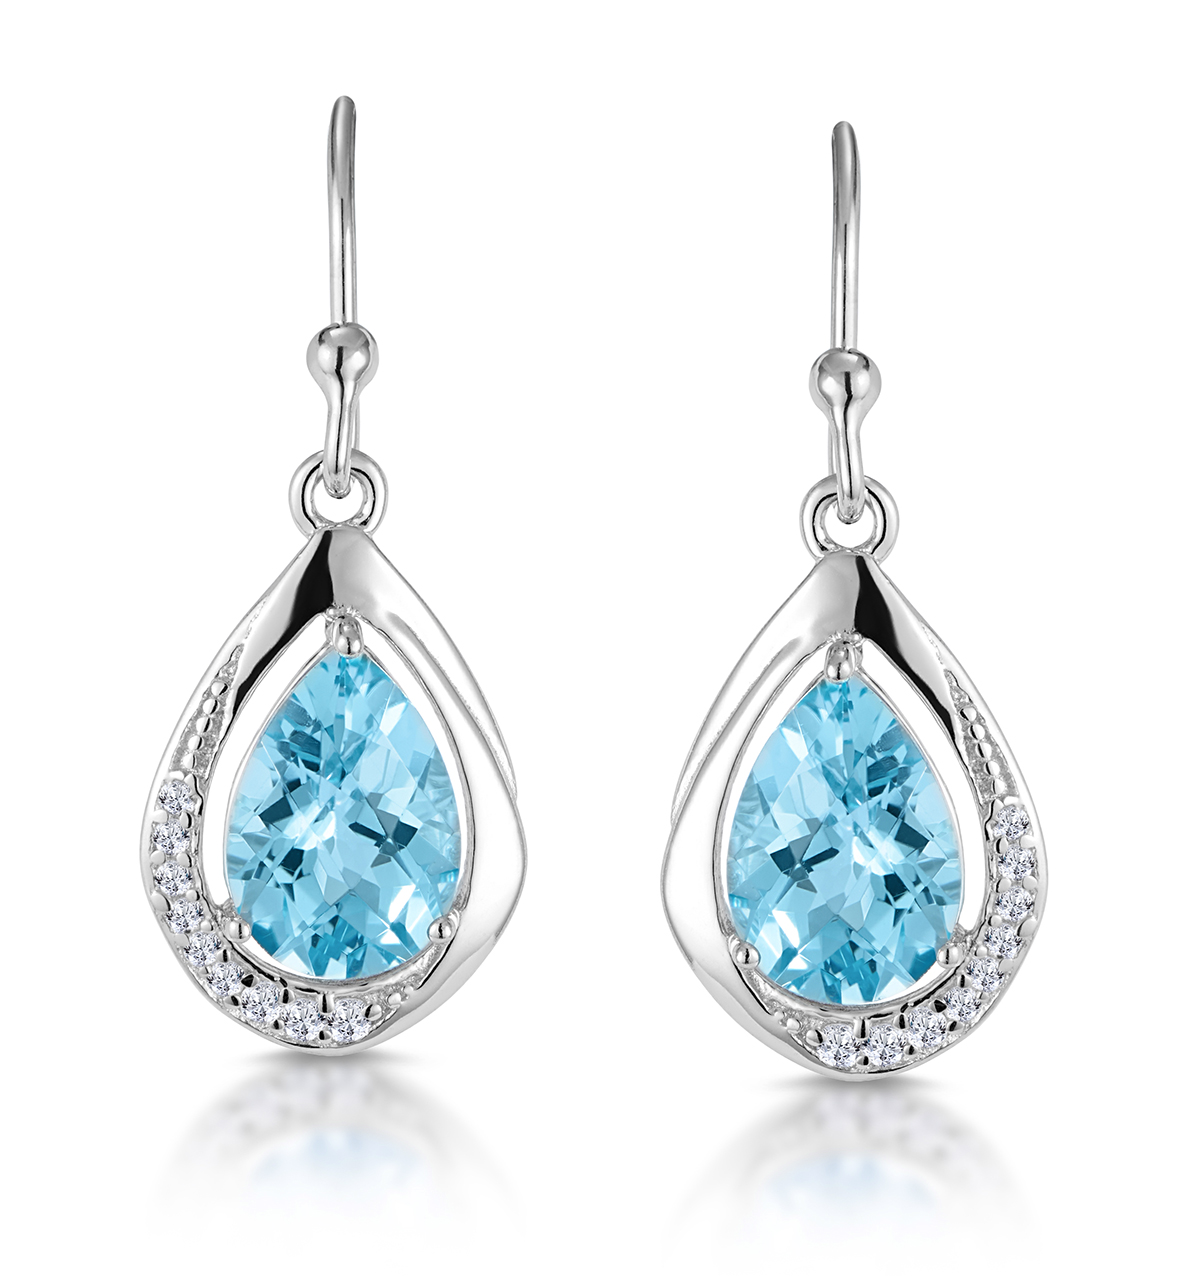 SILVER BLUE TOPAZ AND WHITE TOPAZ TEARDROP EARRINGS -TESORO COLLECTION